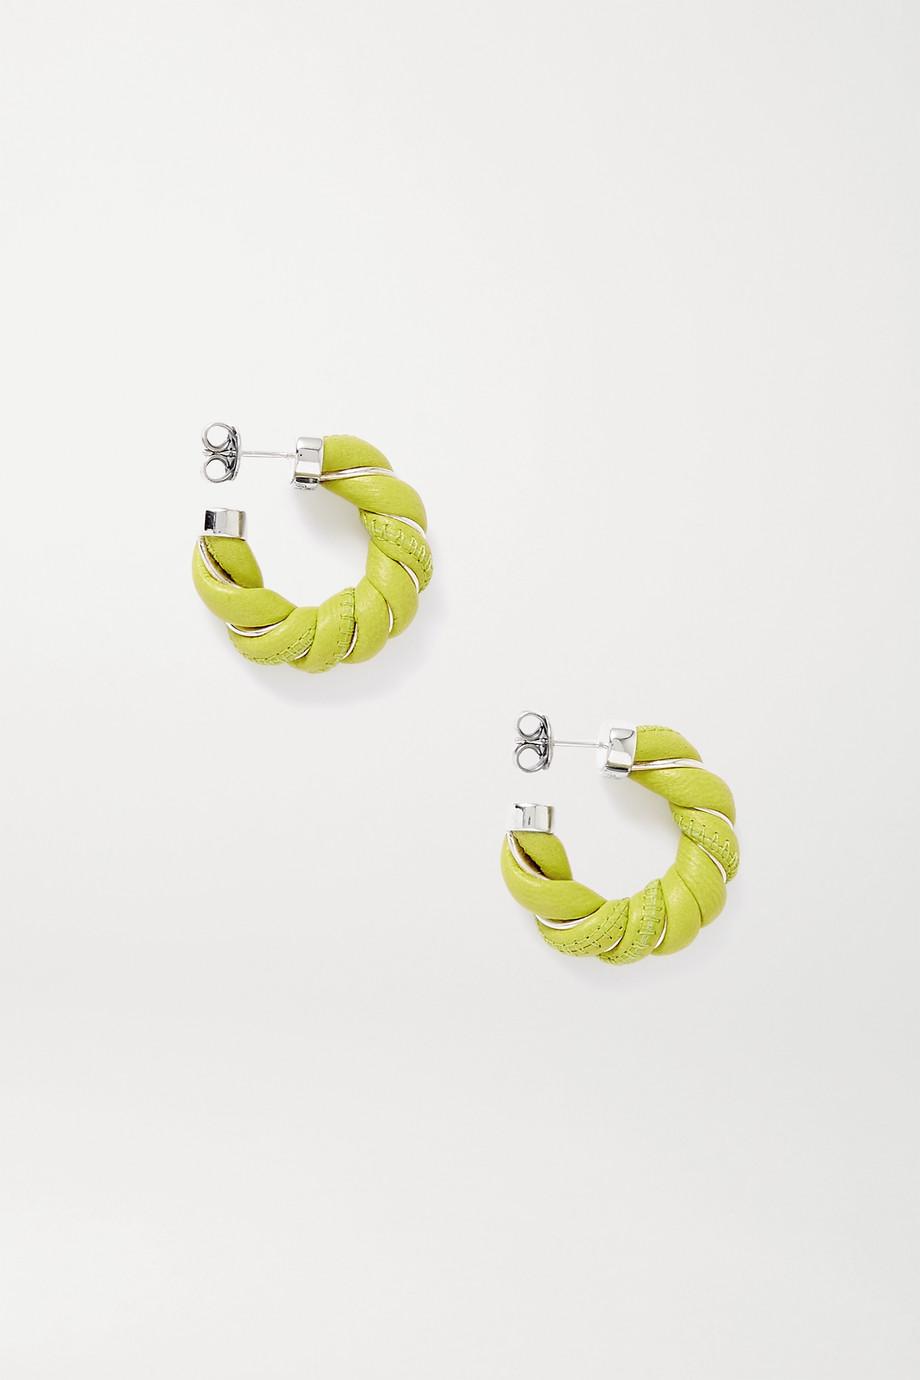 Bottega Veneta Silver-tone and leather hoop earrings